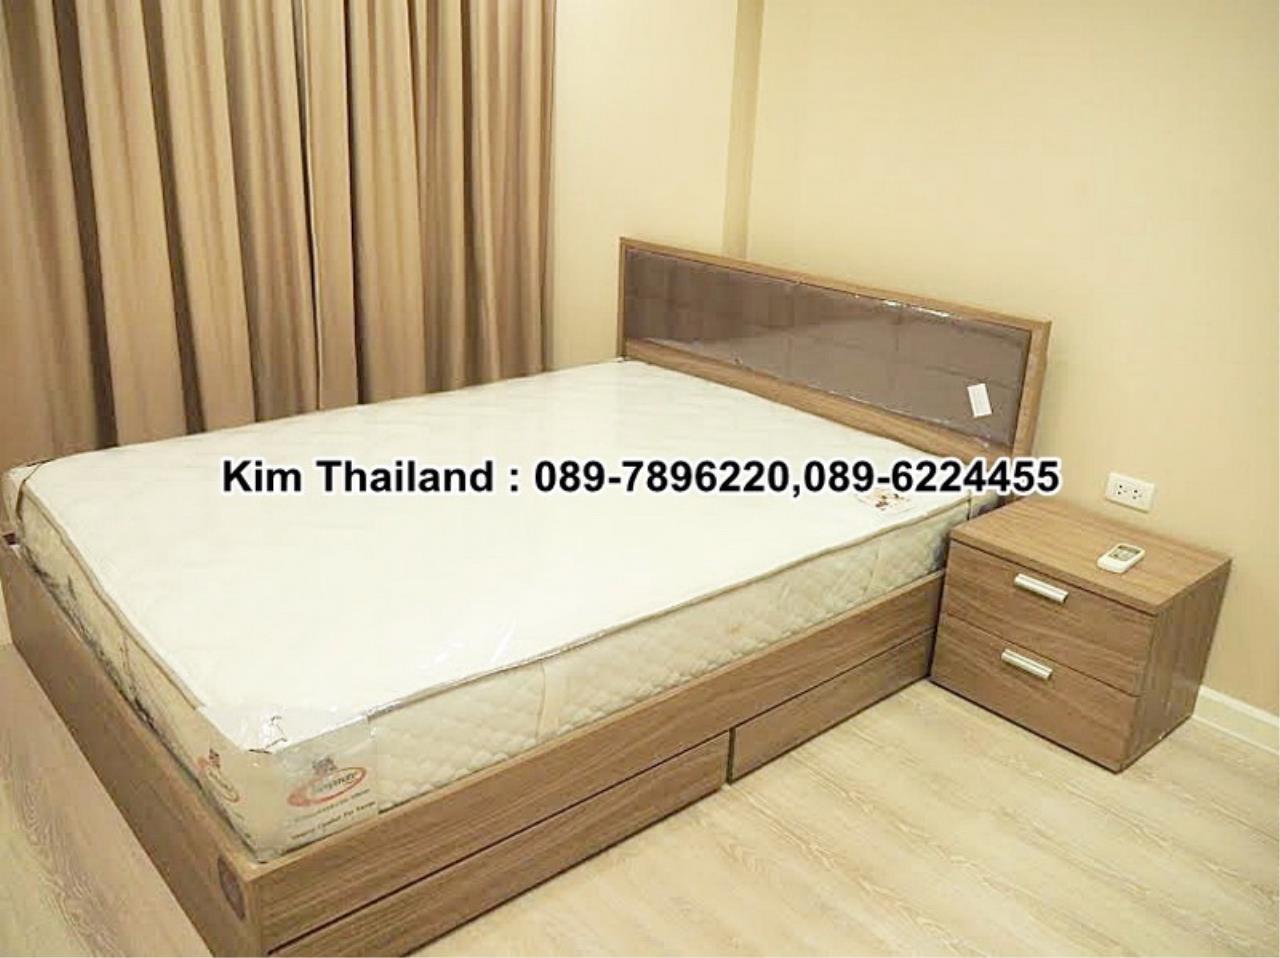 BKKcondorental Agency's For rent, Condo Metroluxe Rama 4., Area 28 sq.m. 1 bedroom. Rental 15,000 THB per month. 1